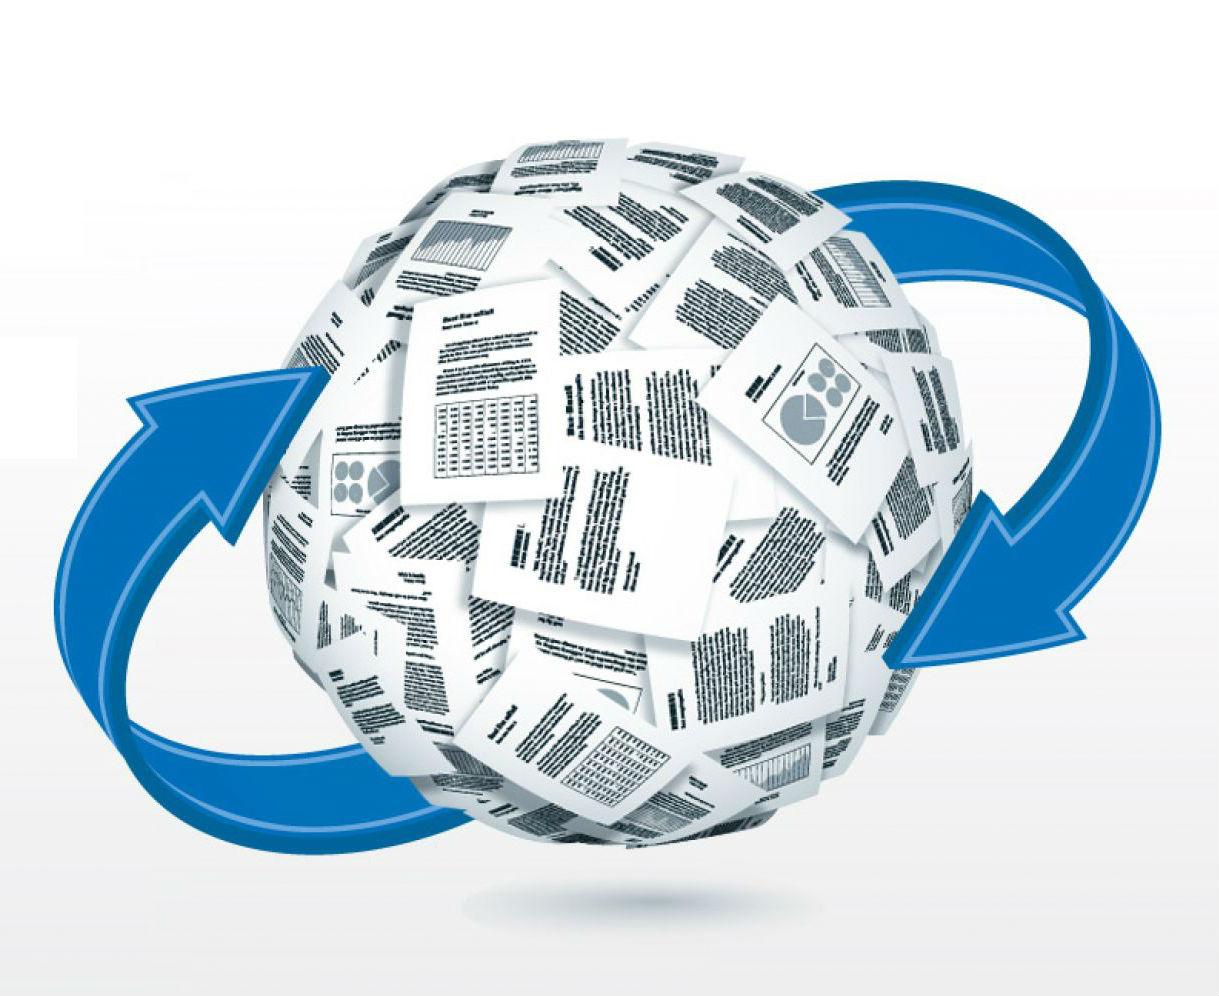 система электронного документооборота sharepoint